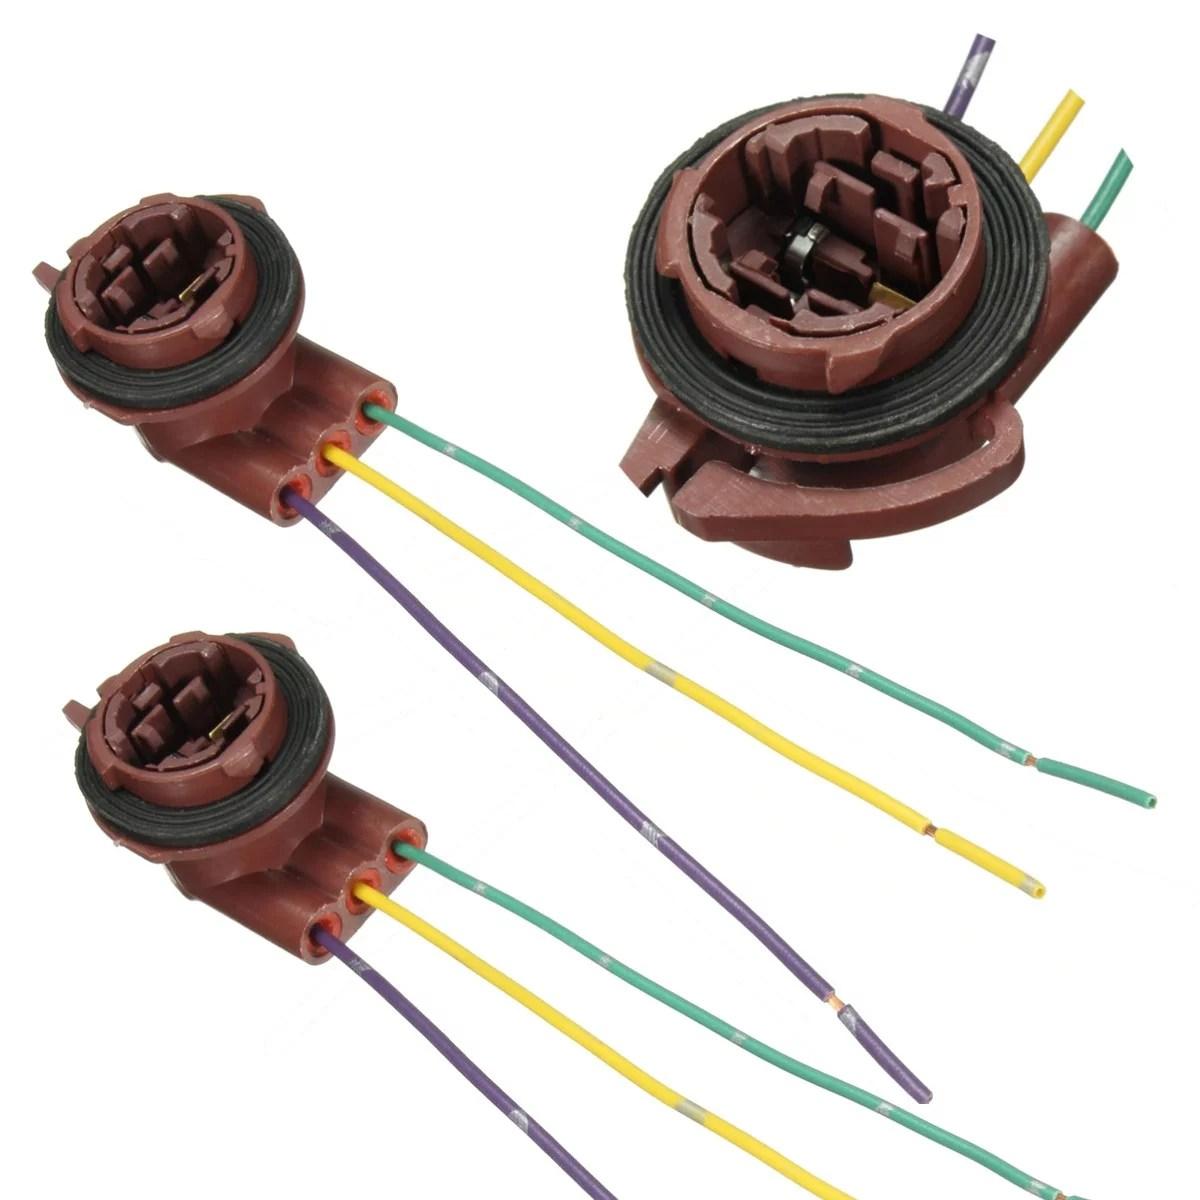 medium resolution of matcc 2pcs 12v brake turn signal indicator light socket wiring electrical wiring handyman 3157 light socket wiring diagram